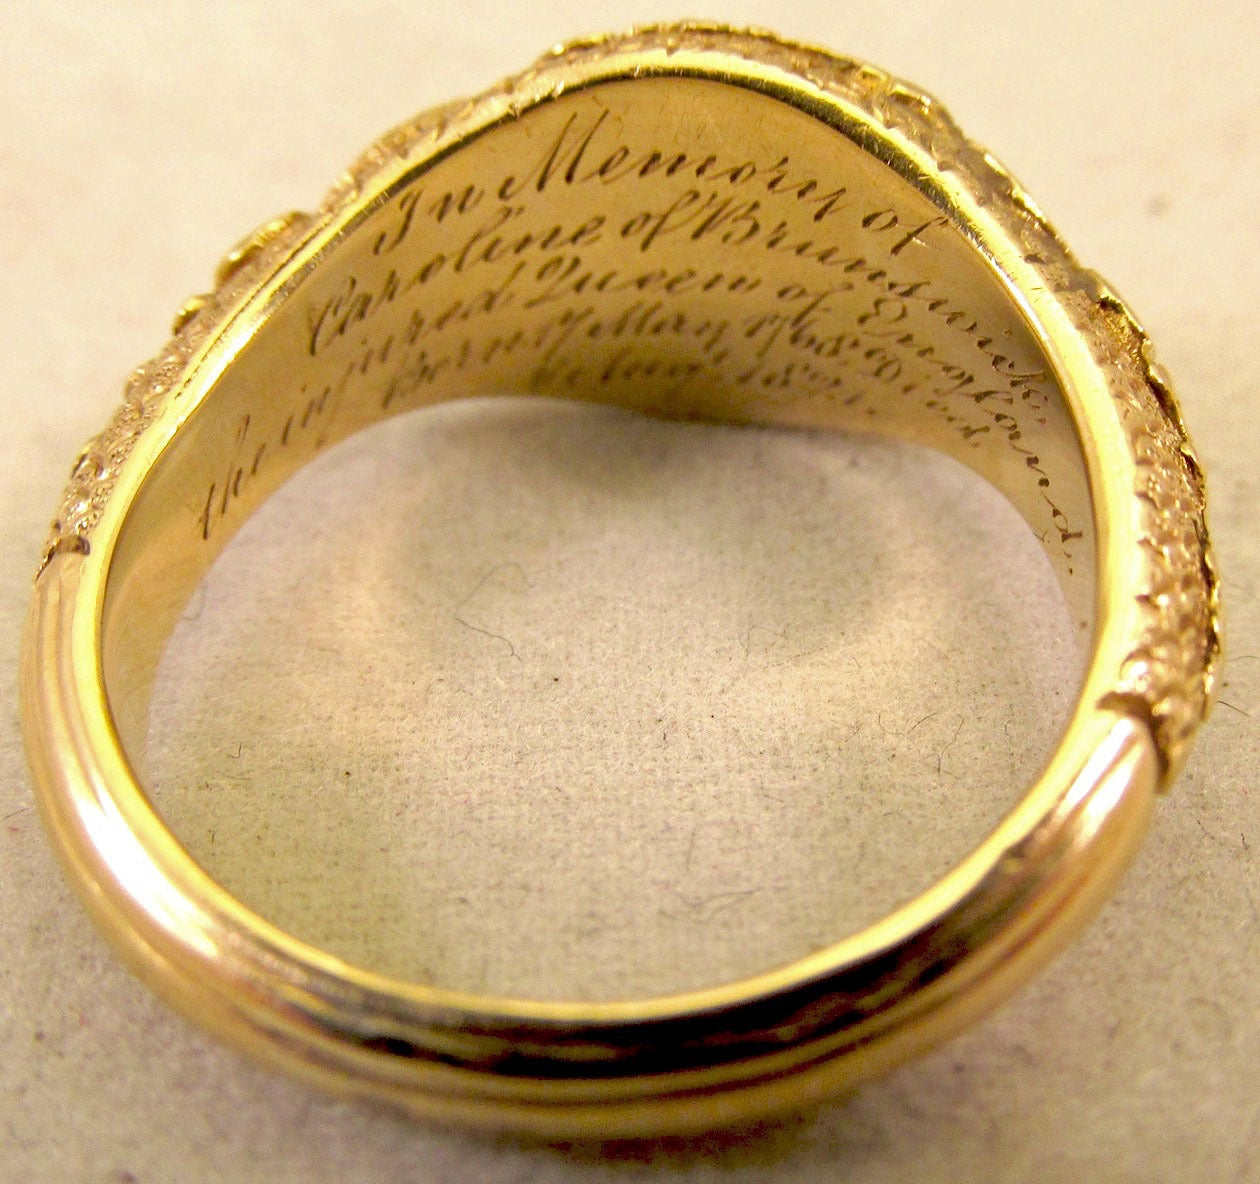 Antique Gold Memorial Ring Caroline of Brunswick Wife of George IV 5